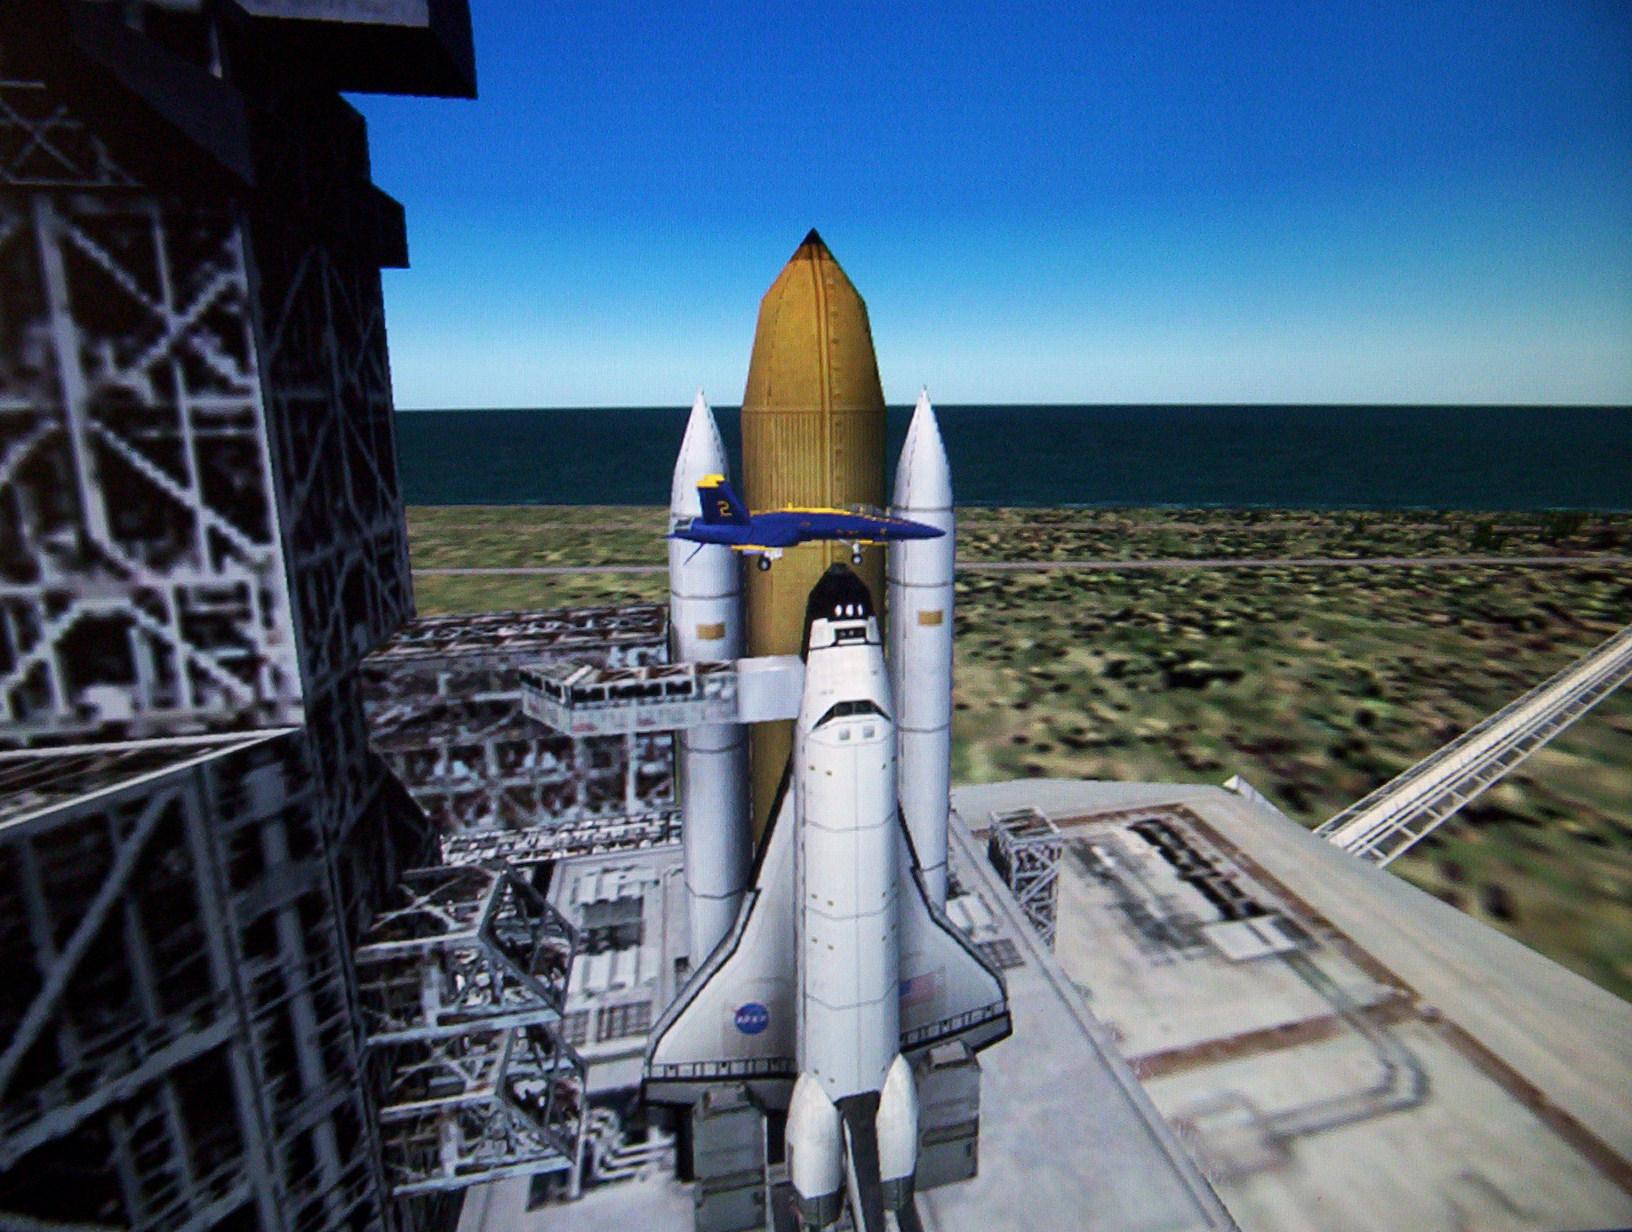 astronaut flight simulator - photo #35